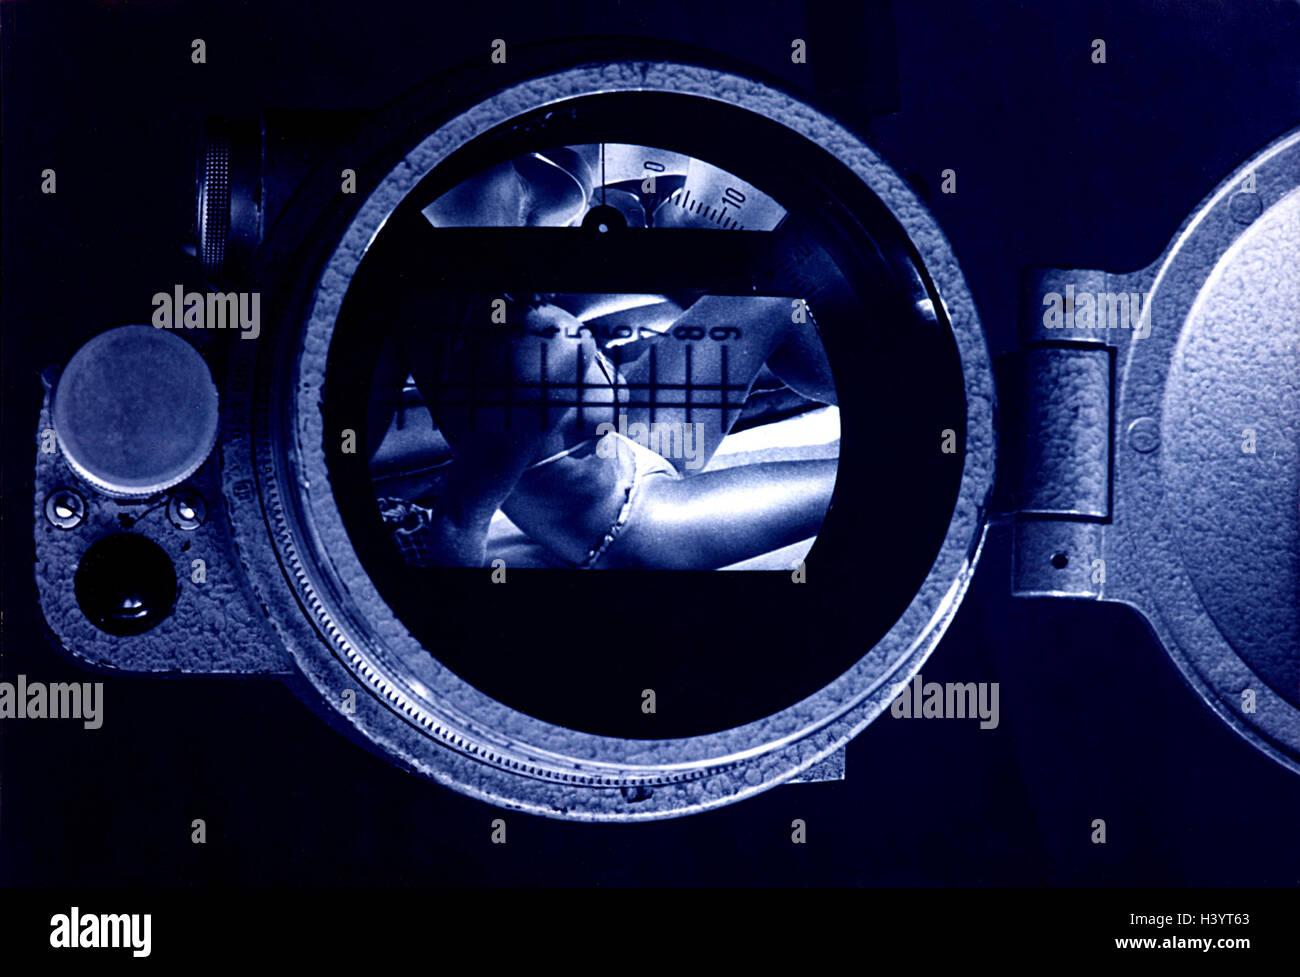 Teleskop optik: bresser spiegel teleskop optik ovp versandkostenfrei